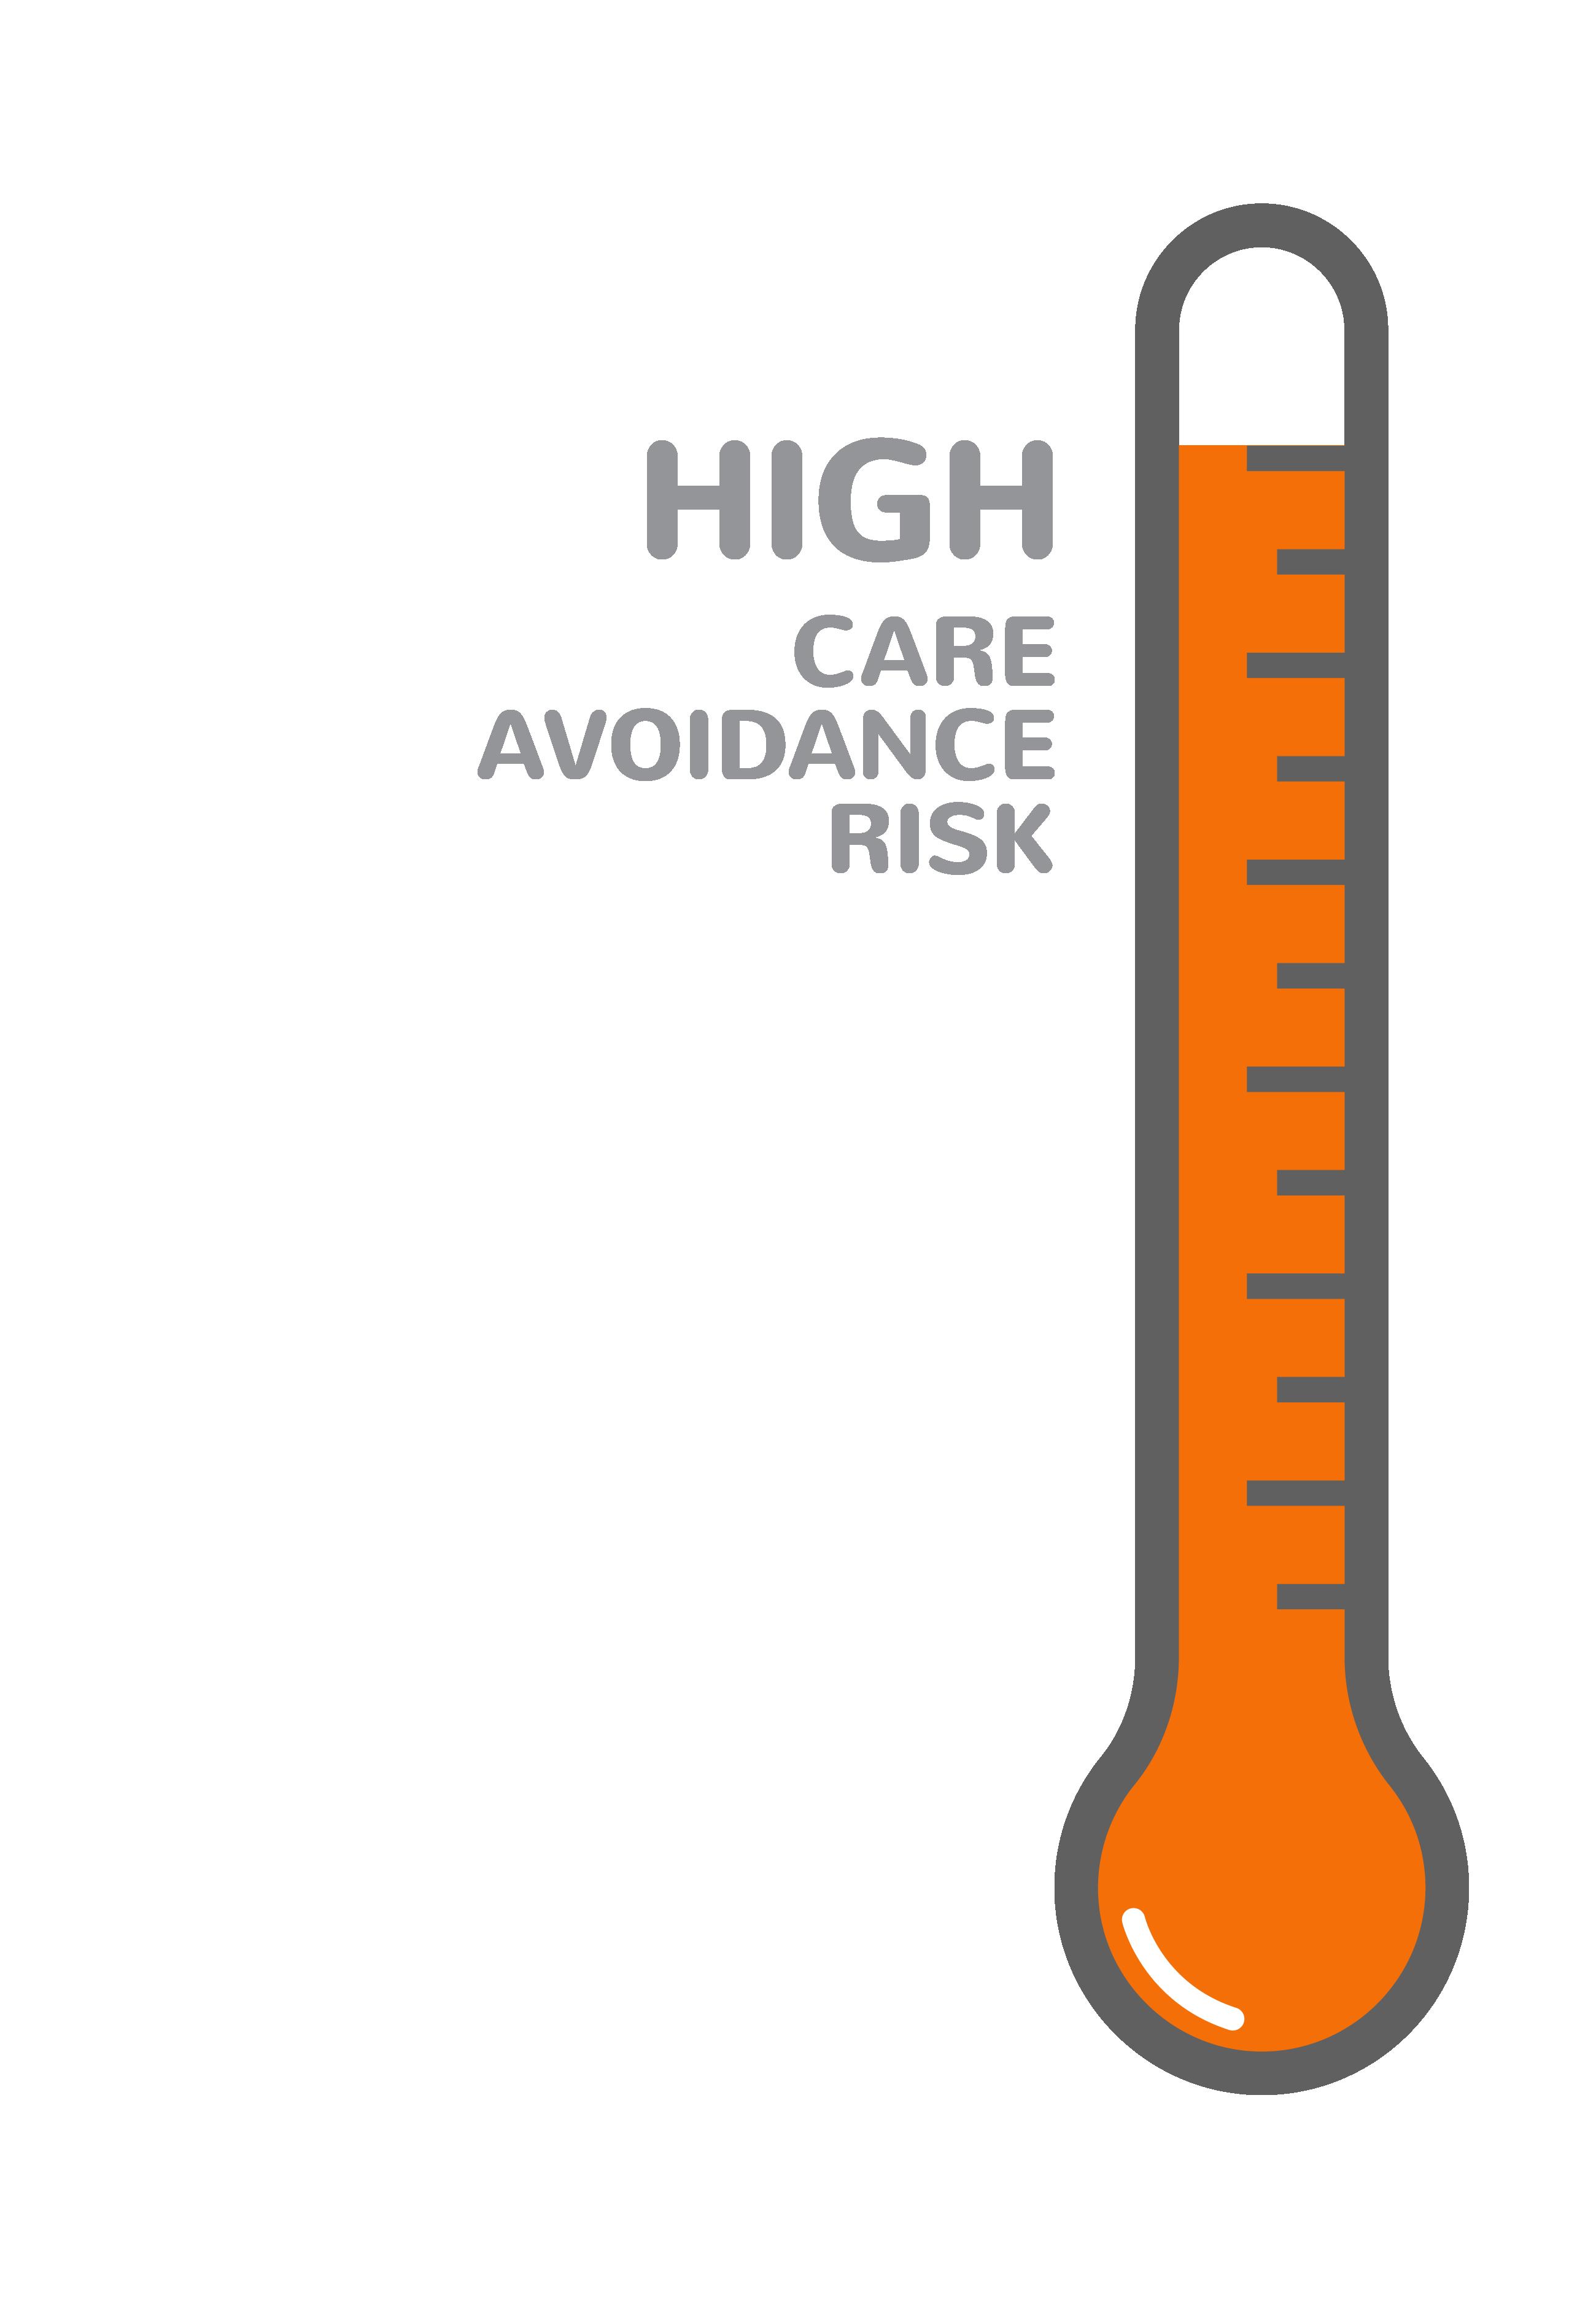 Care Avoidance Risk: High